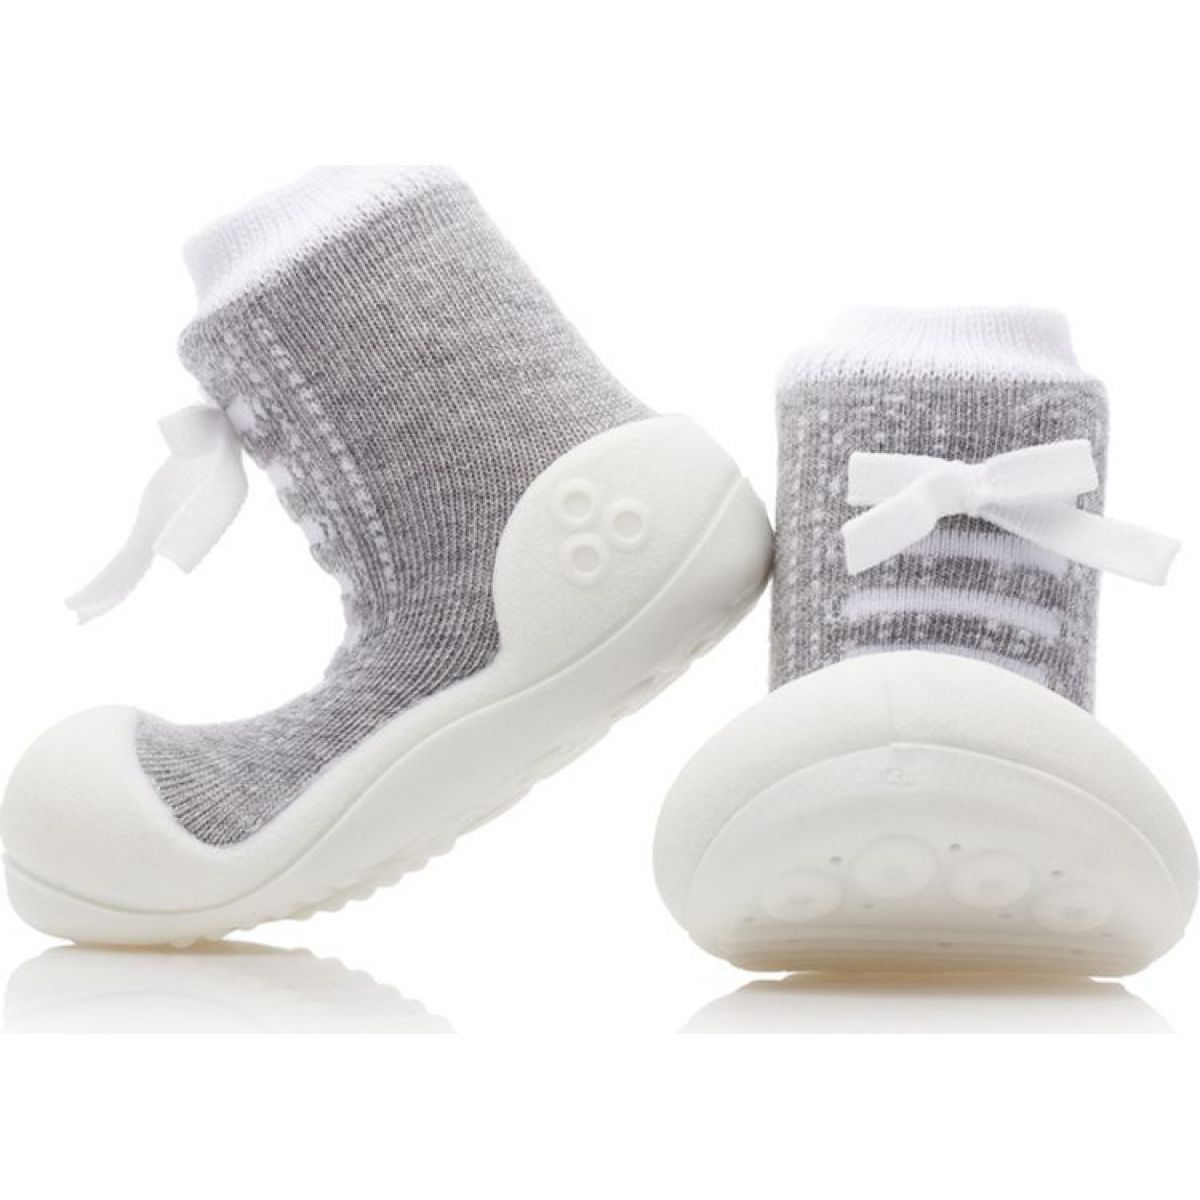 Attipas Sneakers Gray - Euro 22,5